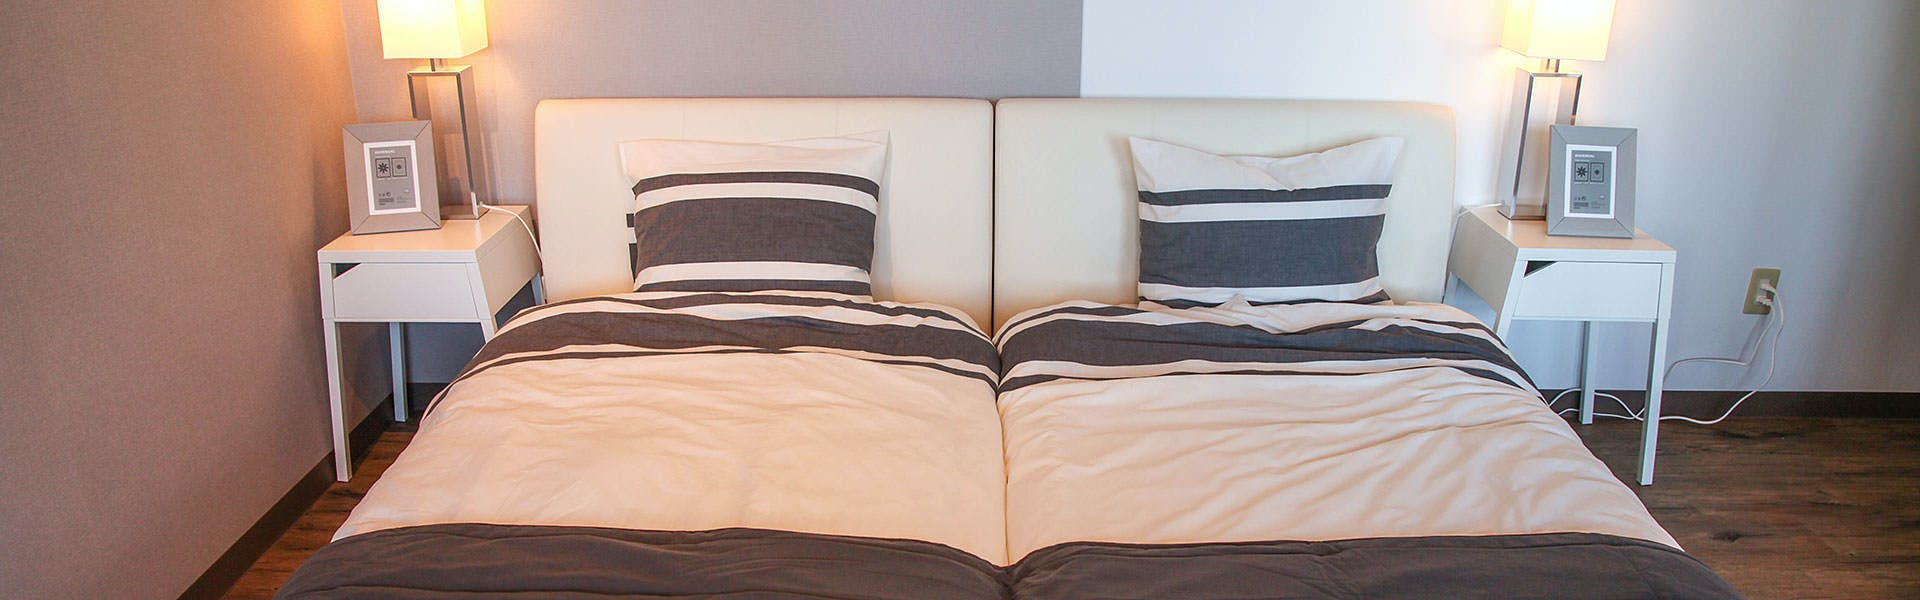 Room-3 ベッドルーム